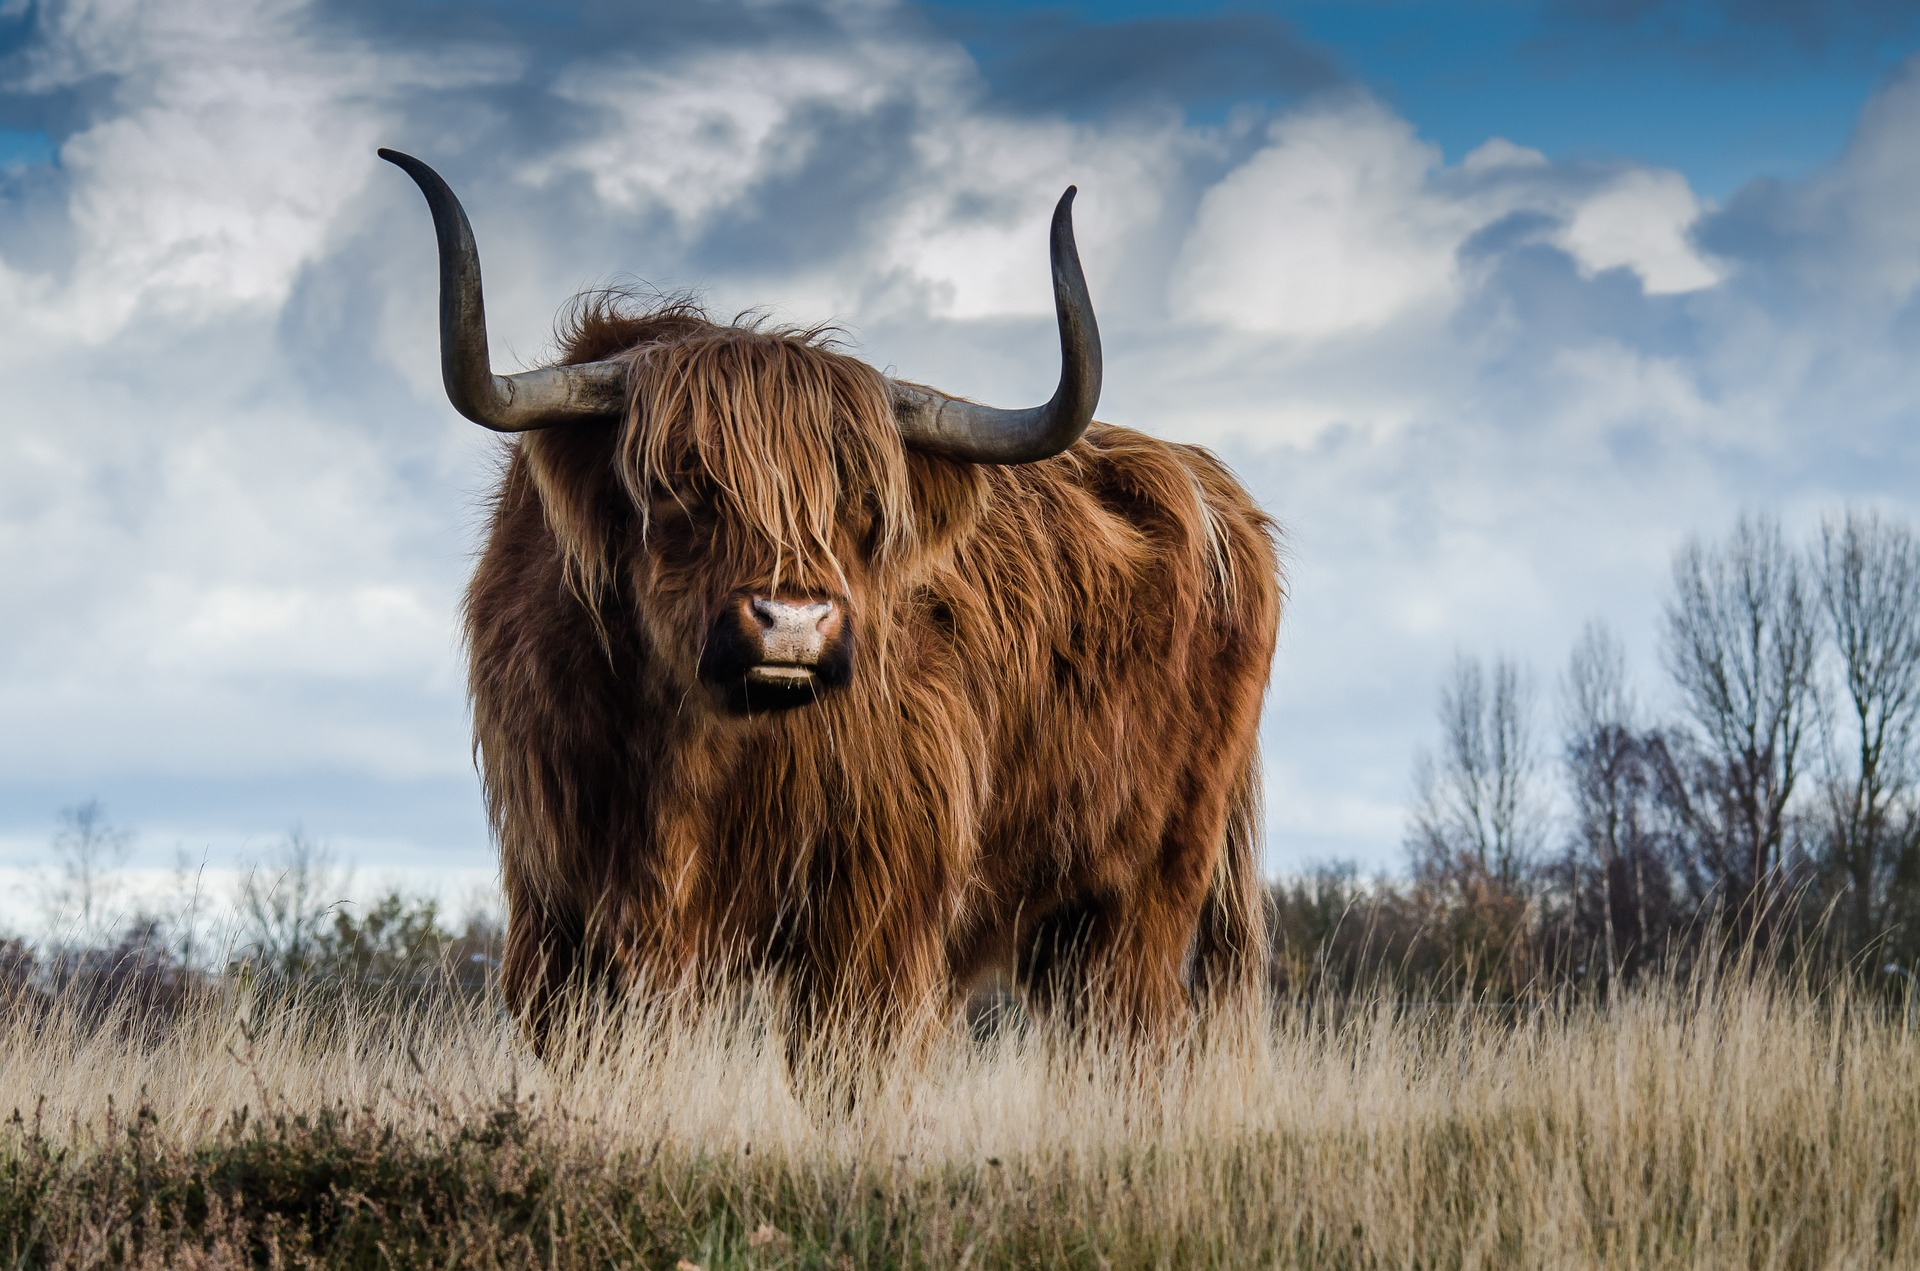 Toro, κέρατα, ζωικό κεφάλαιο, αγρόκτημα, σύννεφα - Wallpapers HD - Professor-falken.com